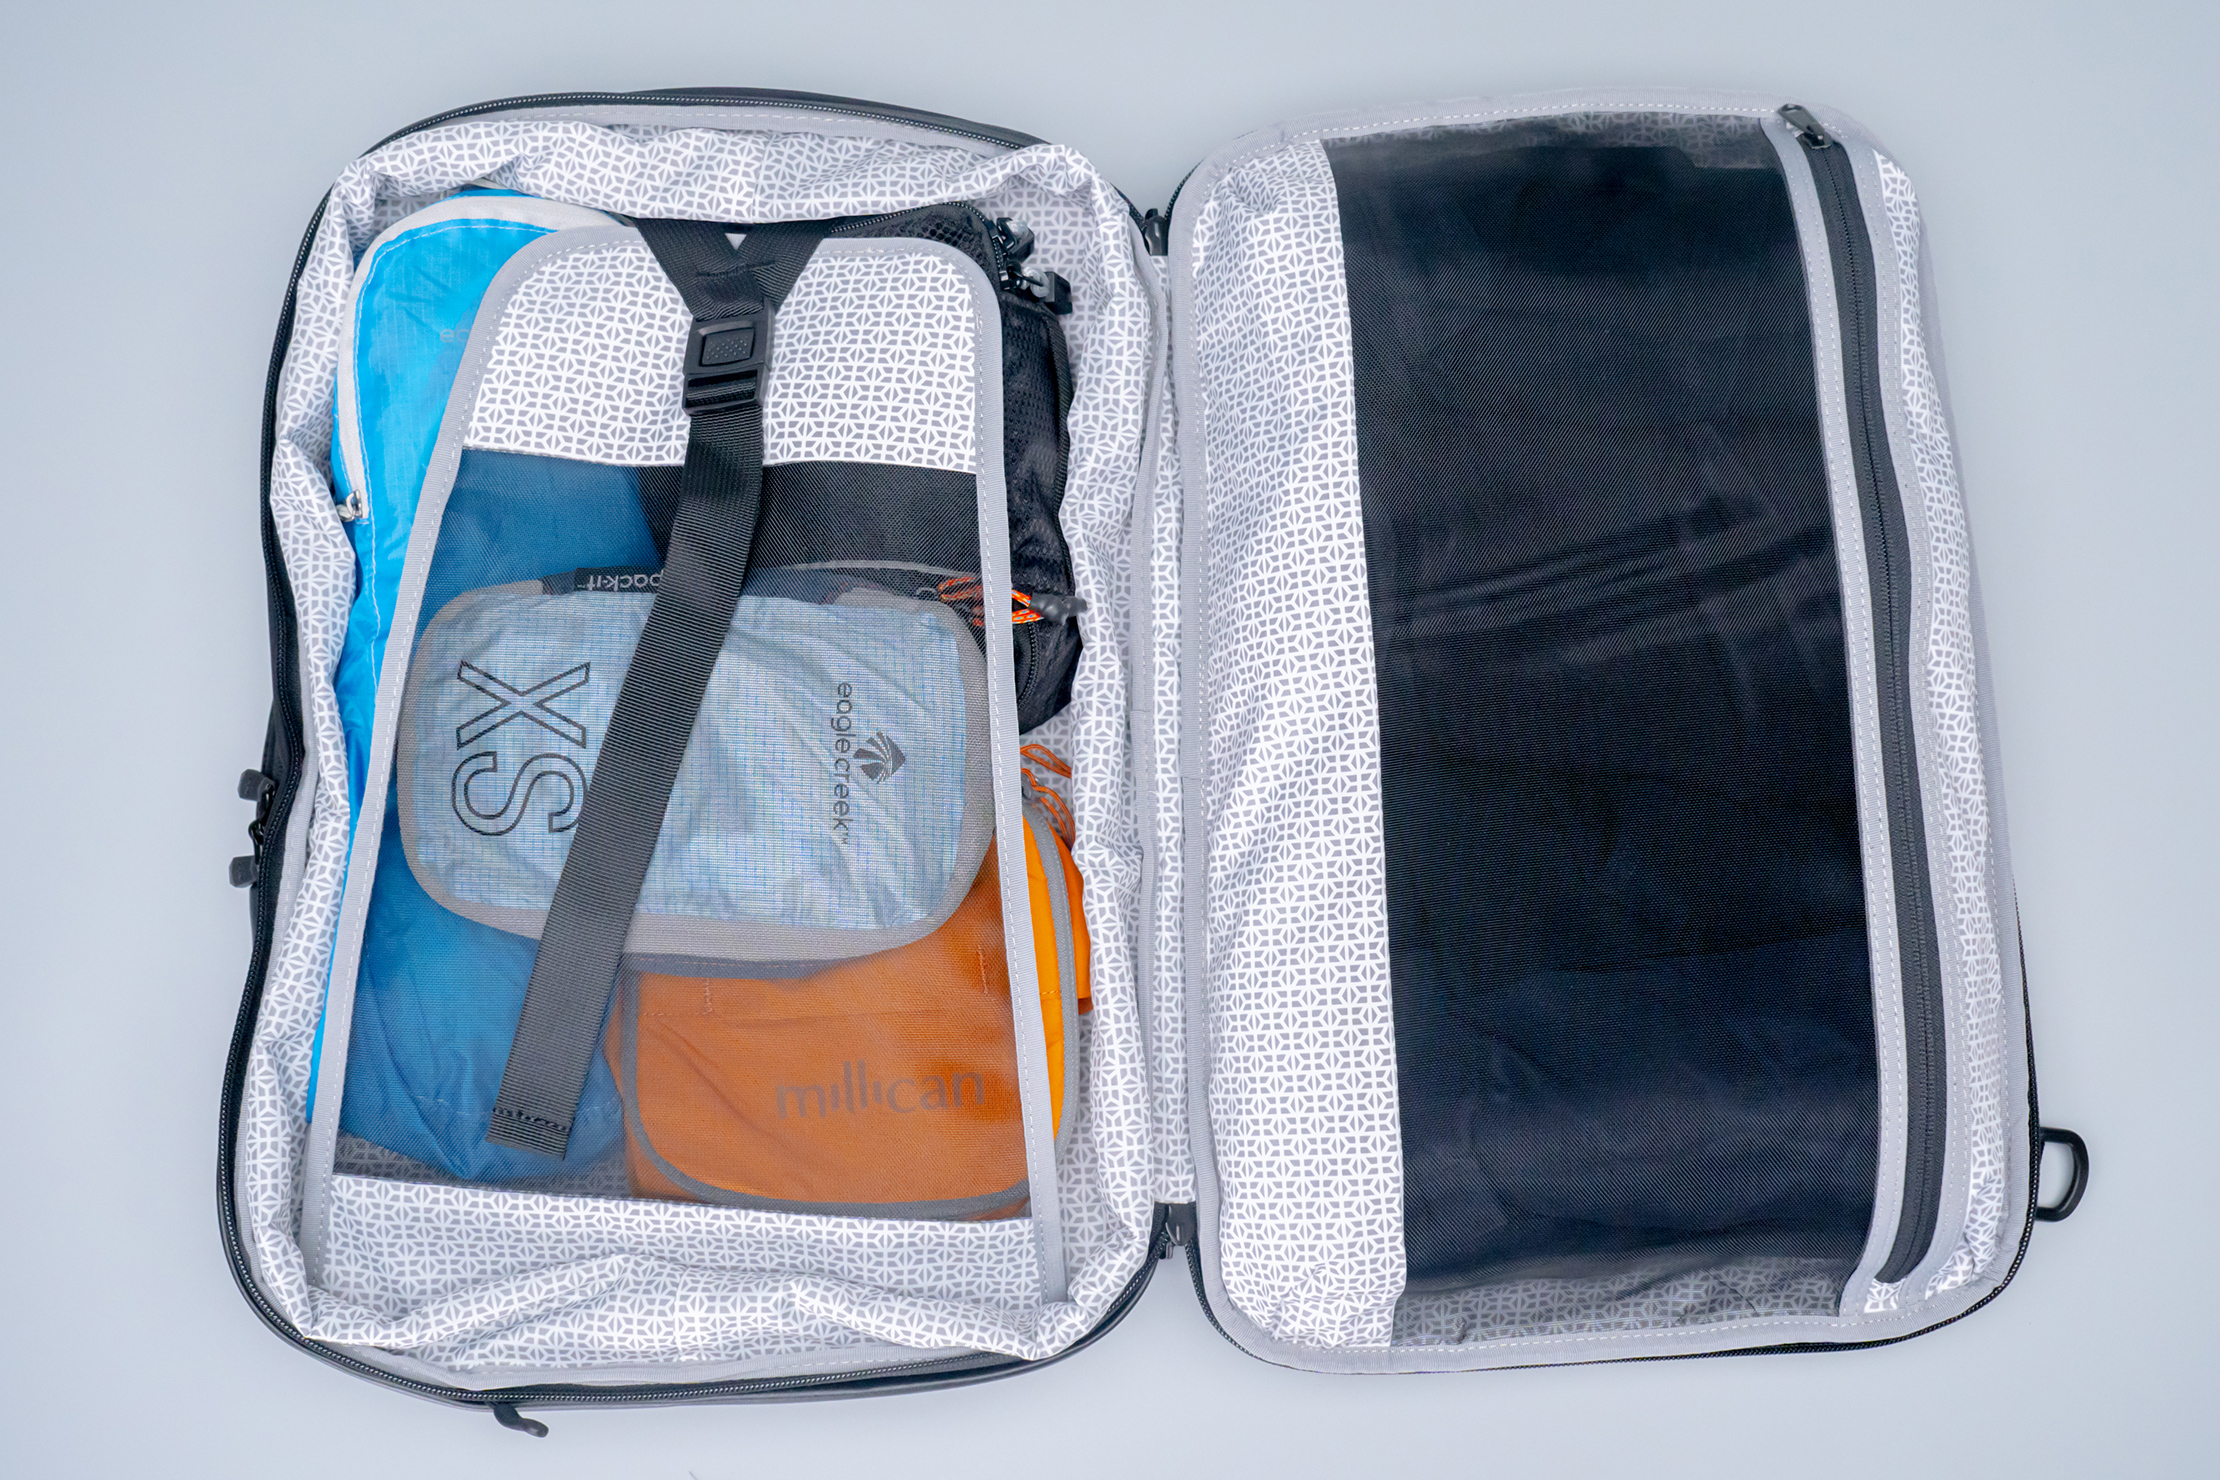 Knack Medium Expandable Pack Series 2 main compartment full spread